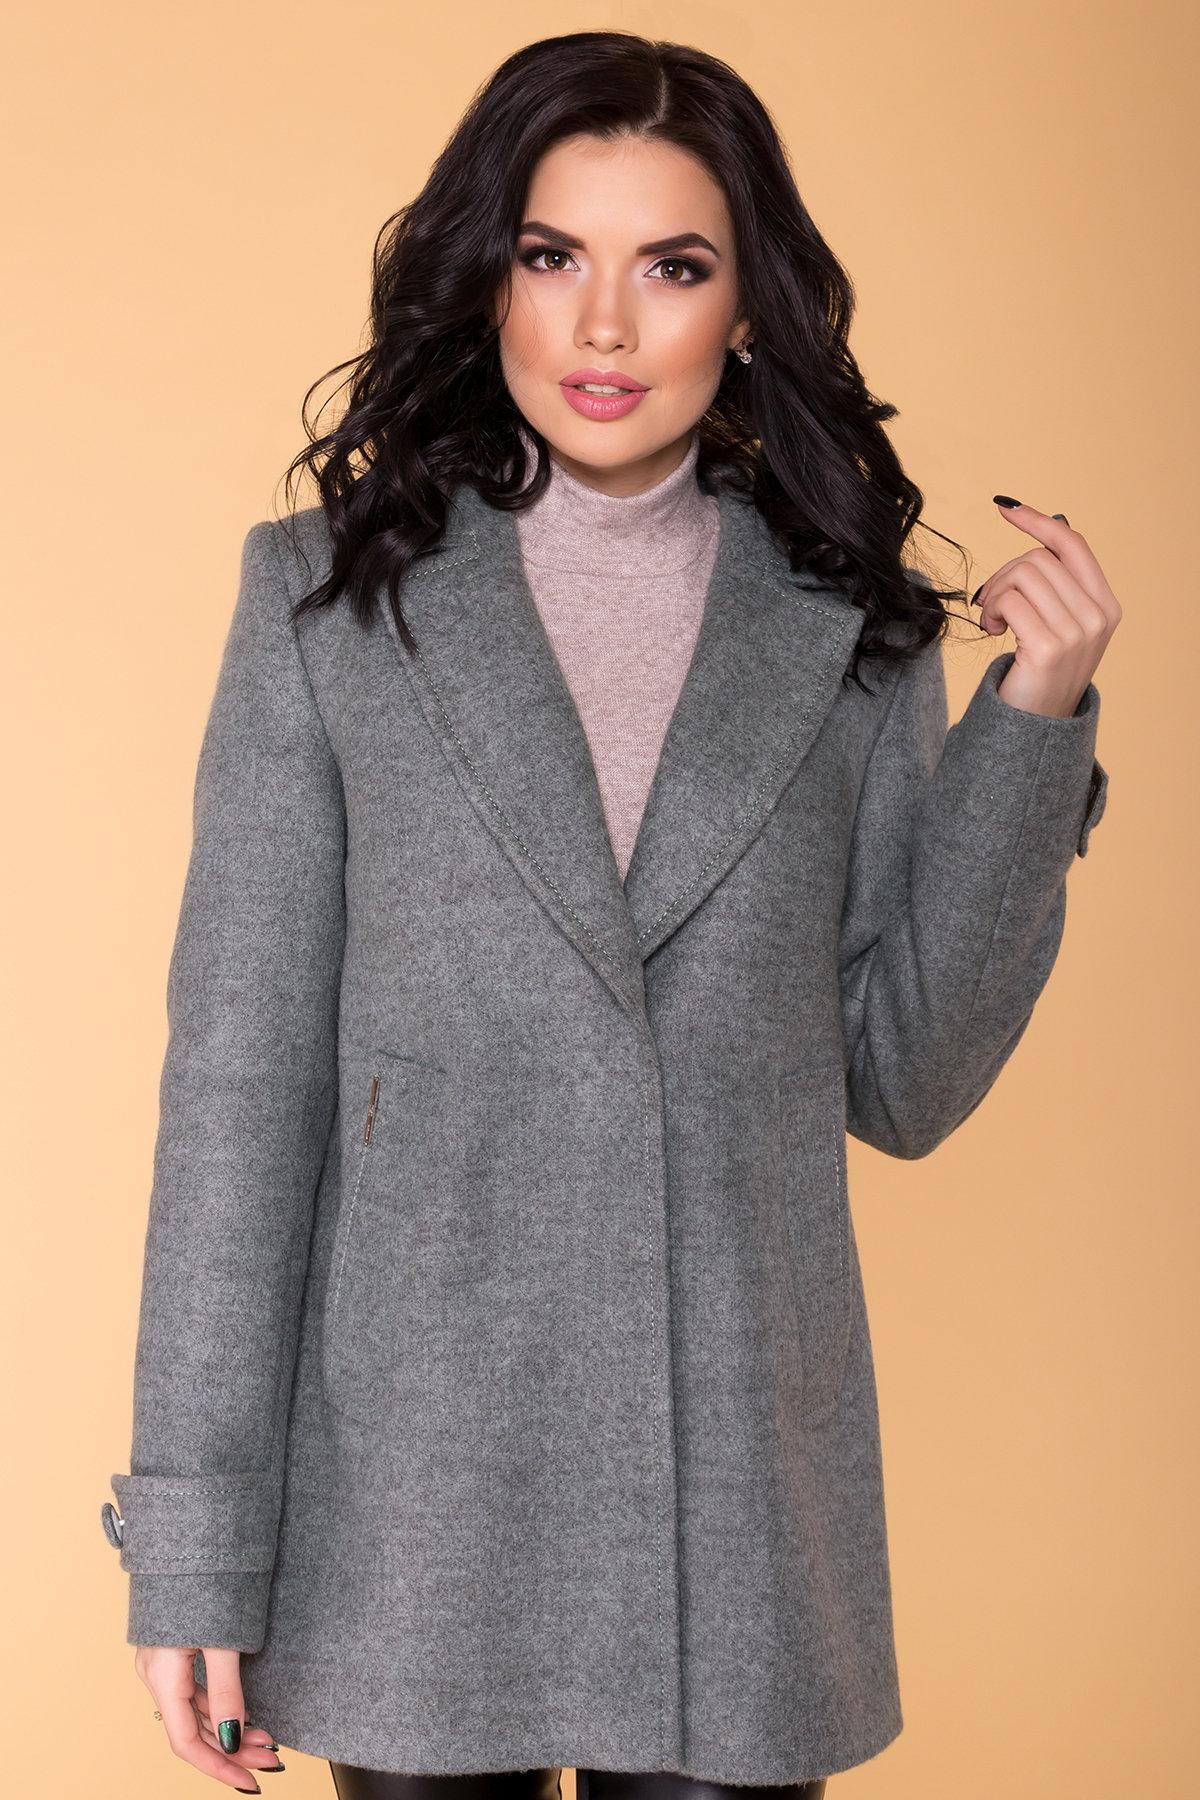 Пальто Нейт 6352 АРТ. 41182 Цвет: Олива - фото 4, интернет магазин tm-modus.ru